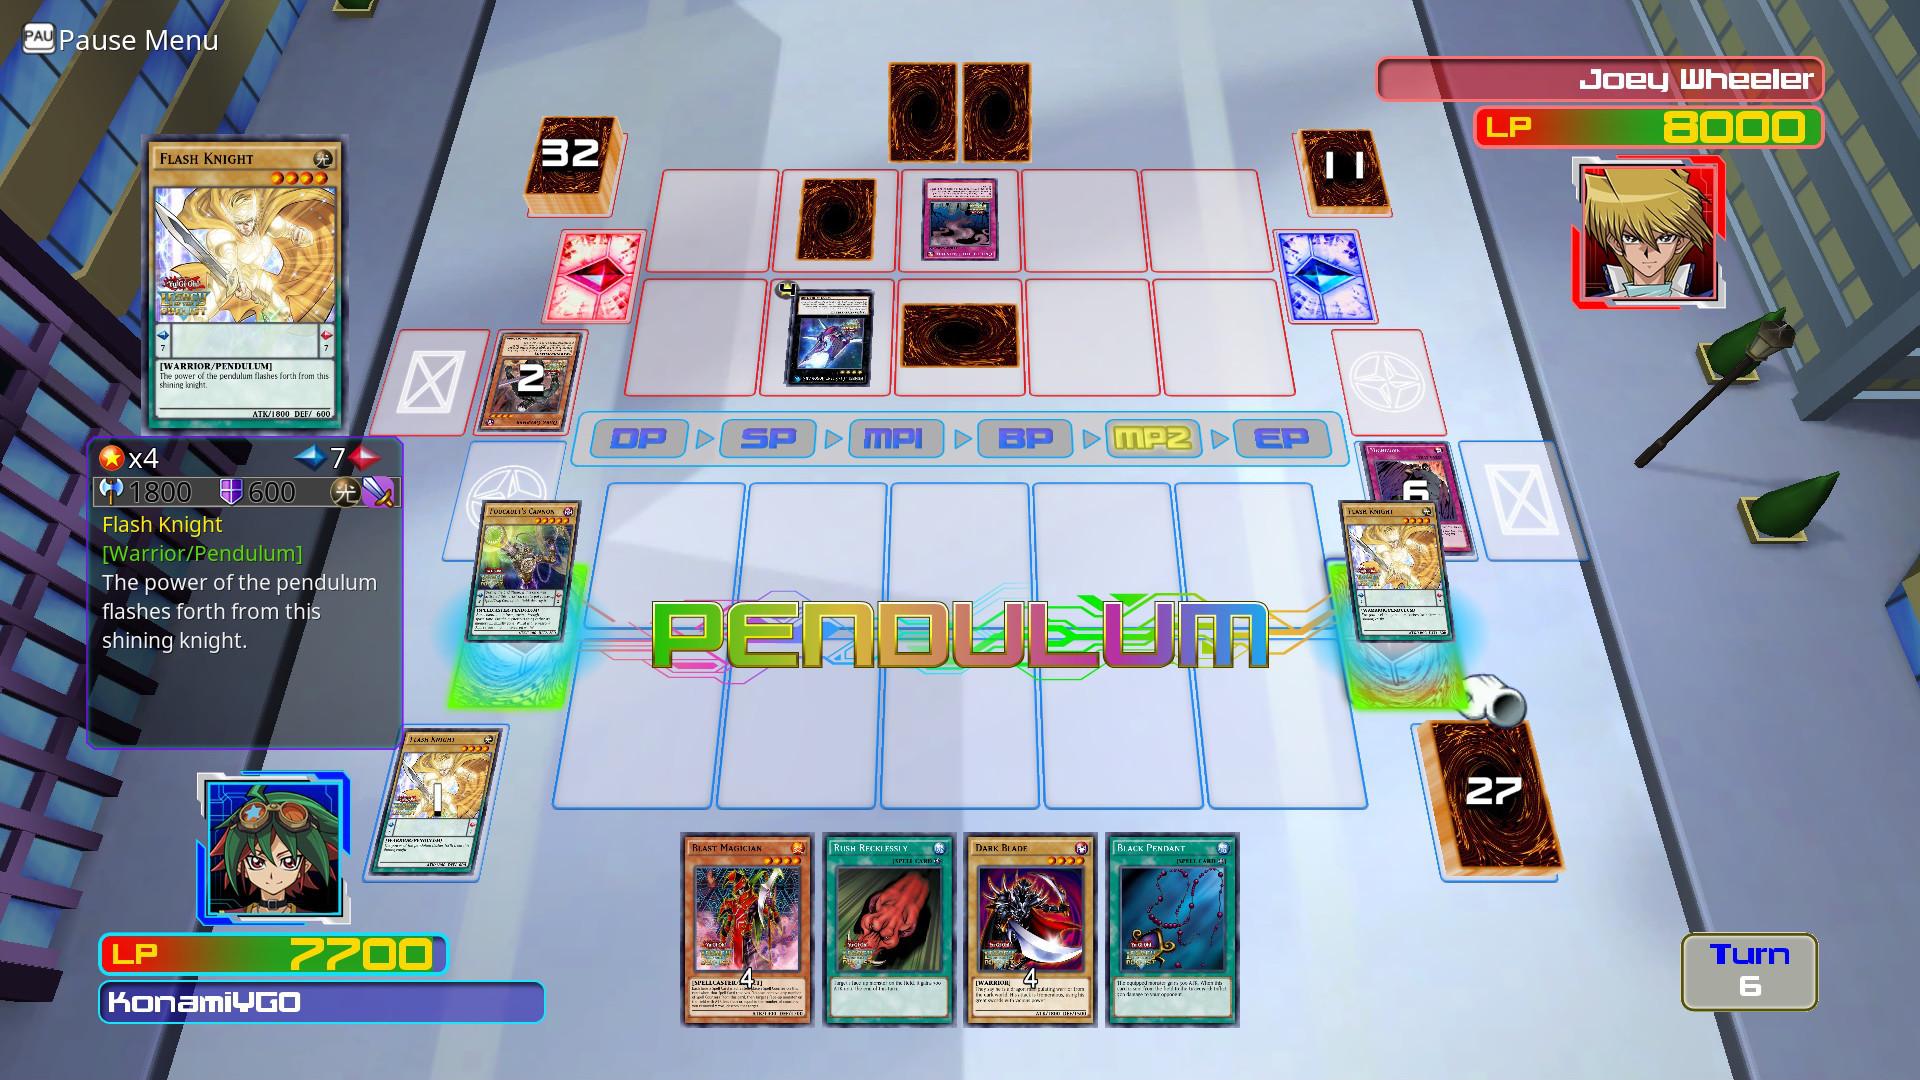 Image 8 yu gi oh legacy of the duelist mod db original aloadofball Images